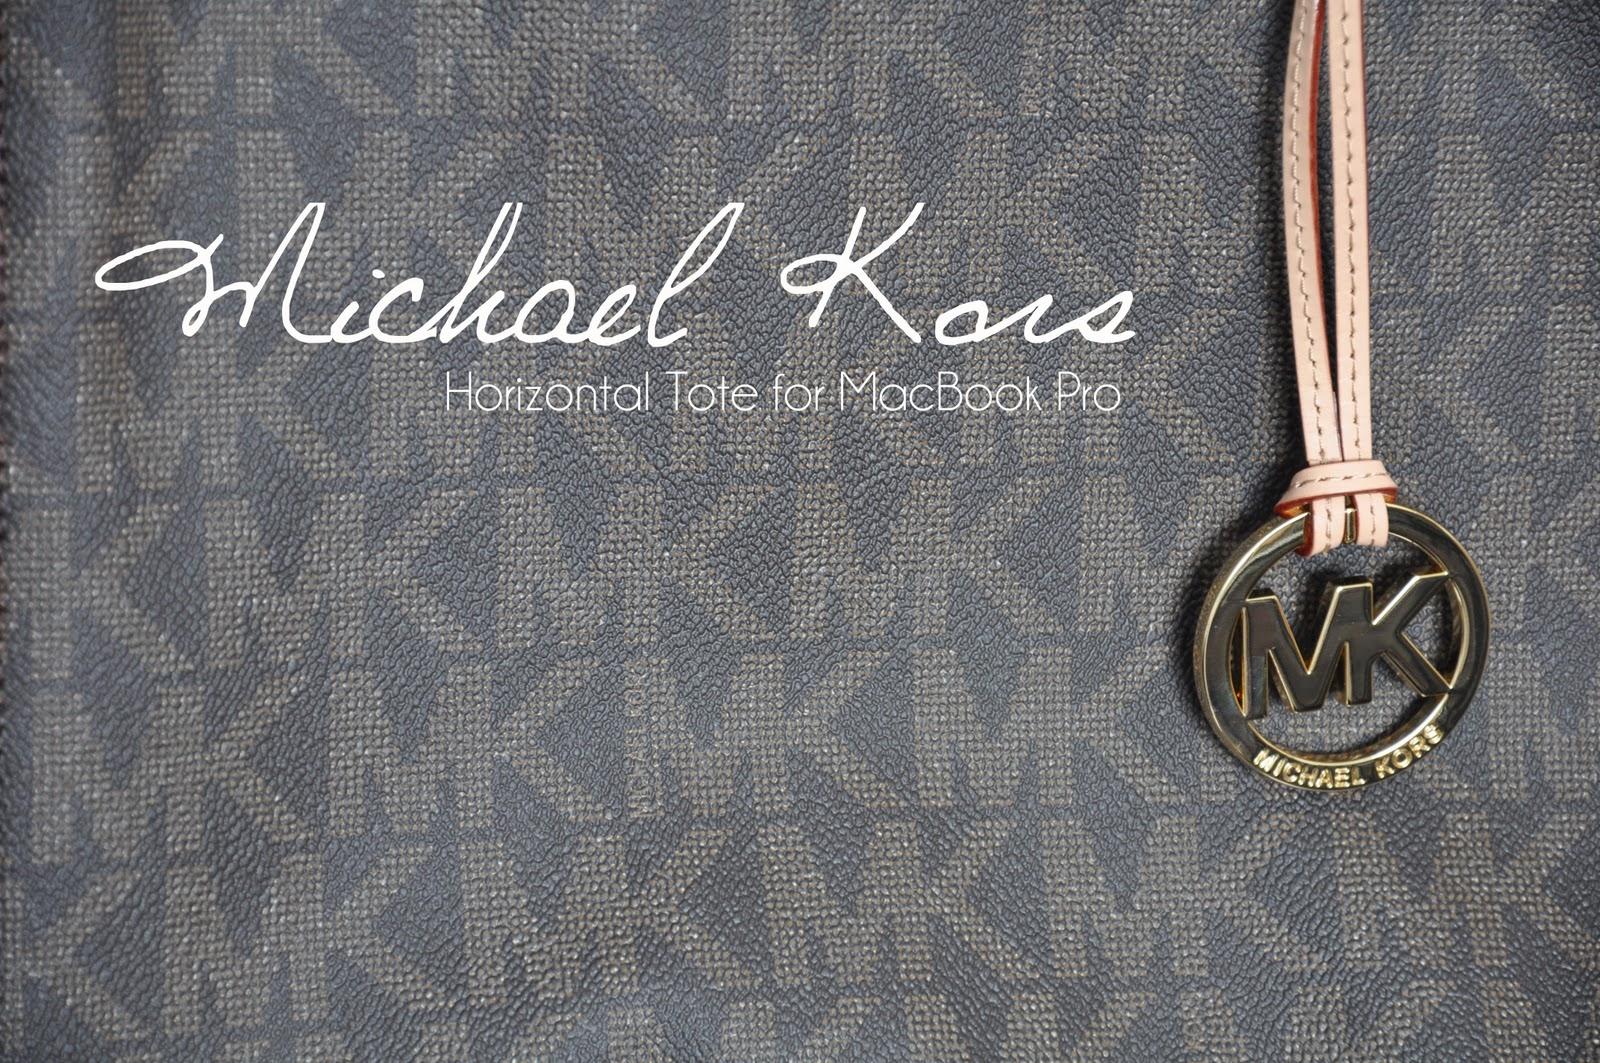 Michael Kors Horizontal Tote for MacBook Pro   Min make-up ...